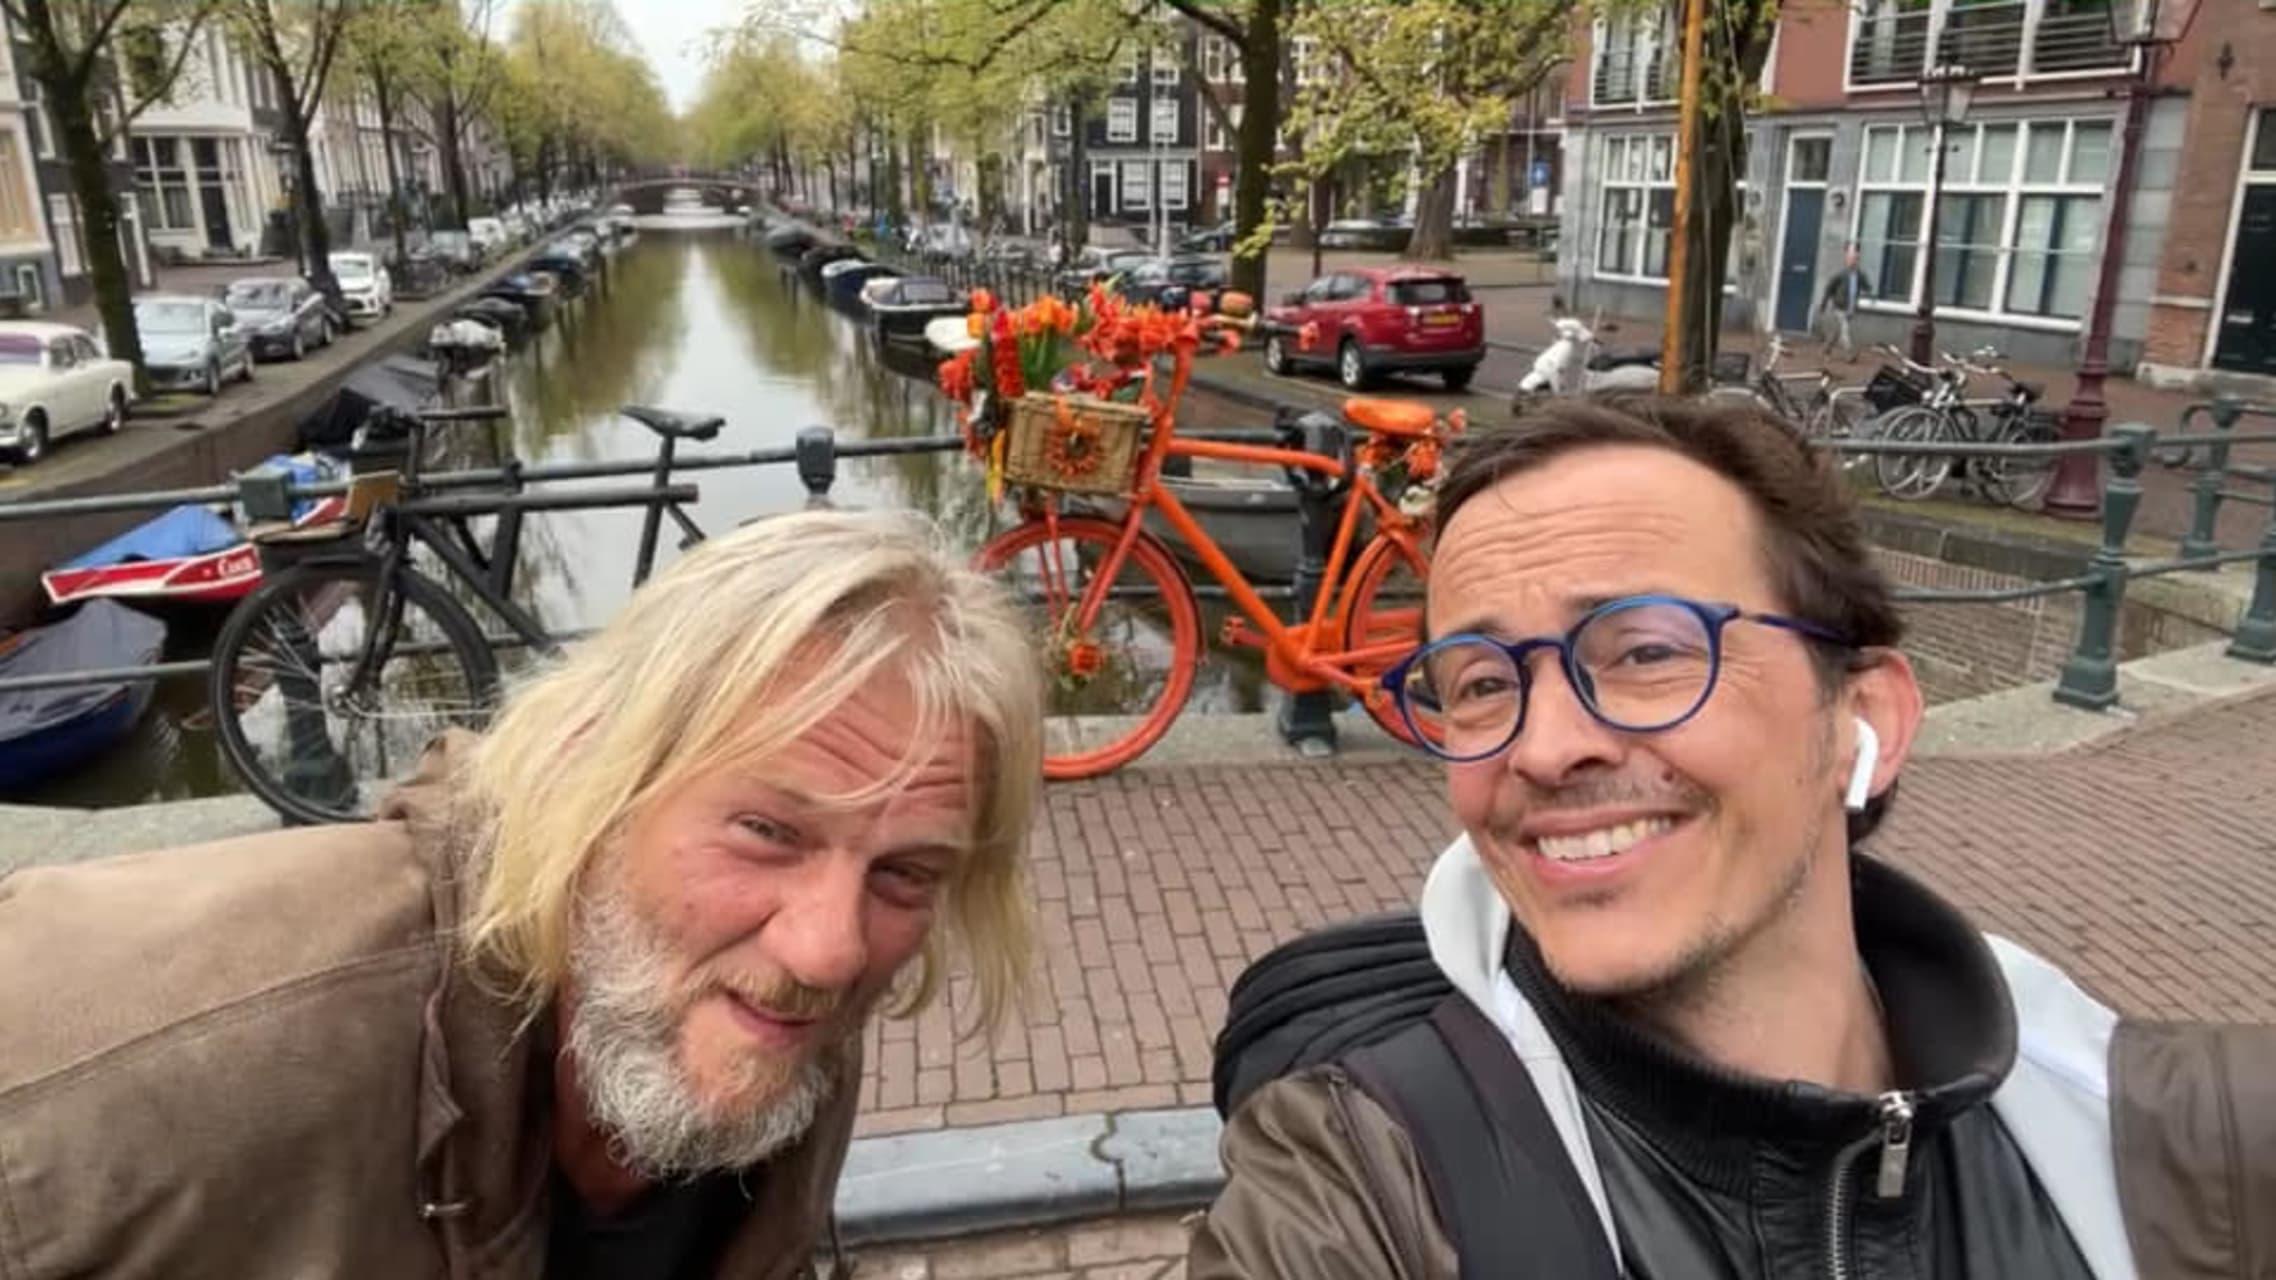 Amsterdam - Flower Power, Meet the Flower Bike Man in Amsterdam